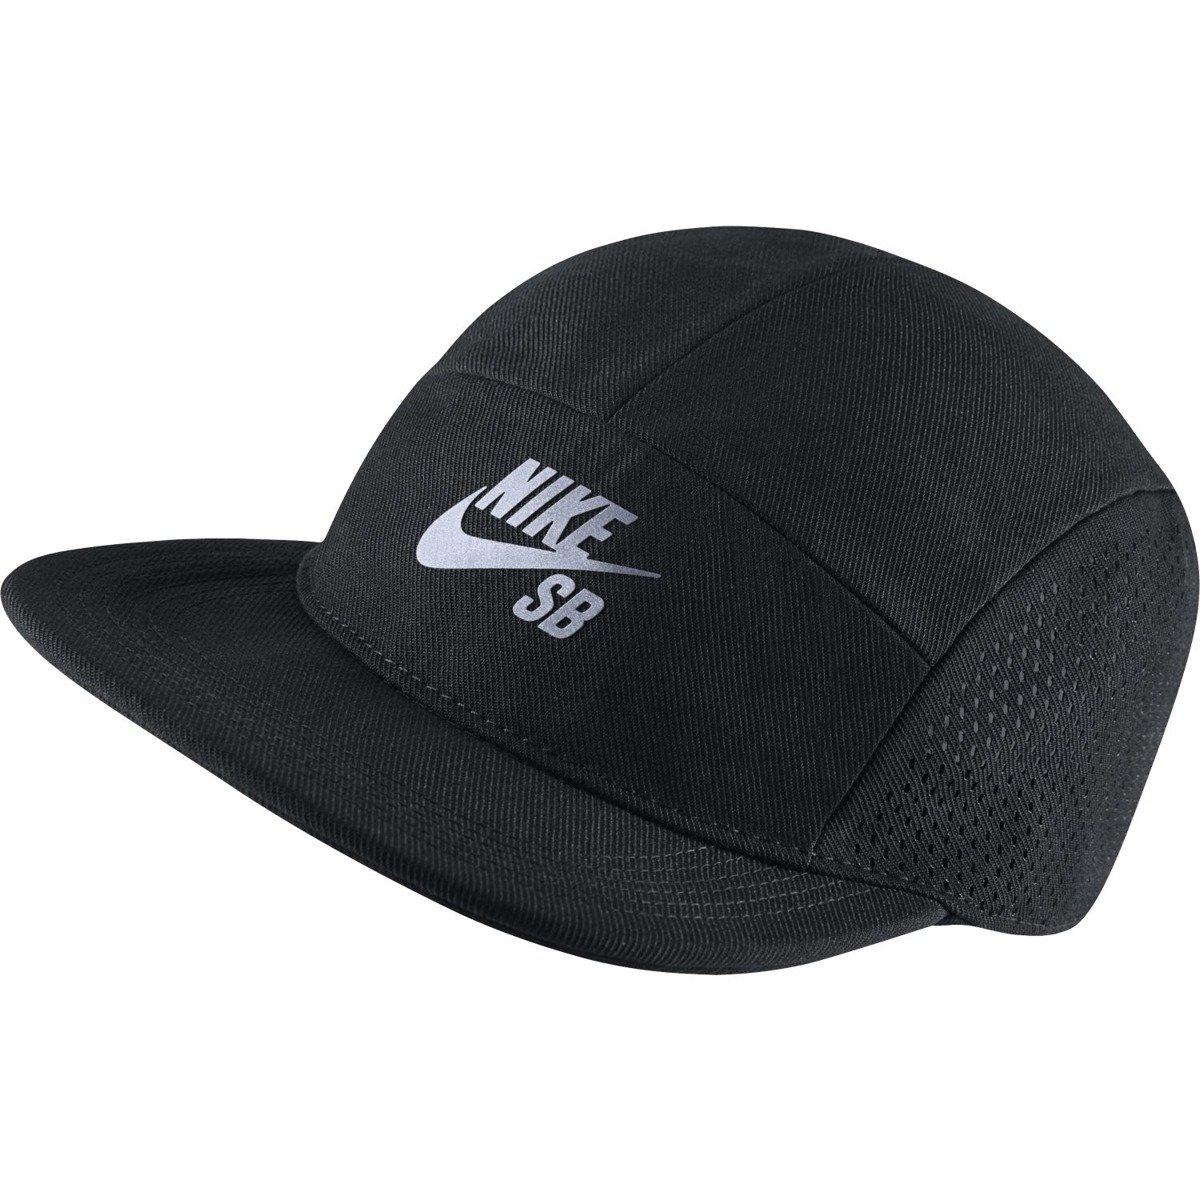 super popular 5e982 aaecf Czapka Nike SB Icon Snapback MULBERRY BLACK BLACK SAIL   Clothes   Cap   Cap  Brands   Nike SB   Skateshop Miniramp.pl